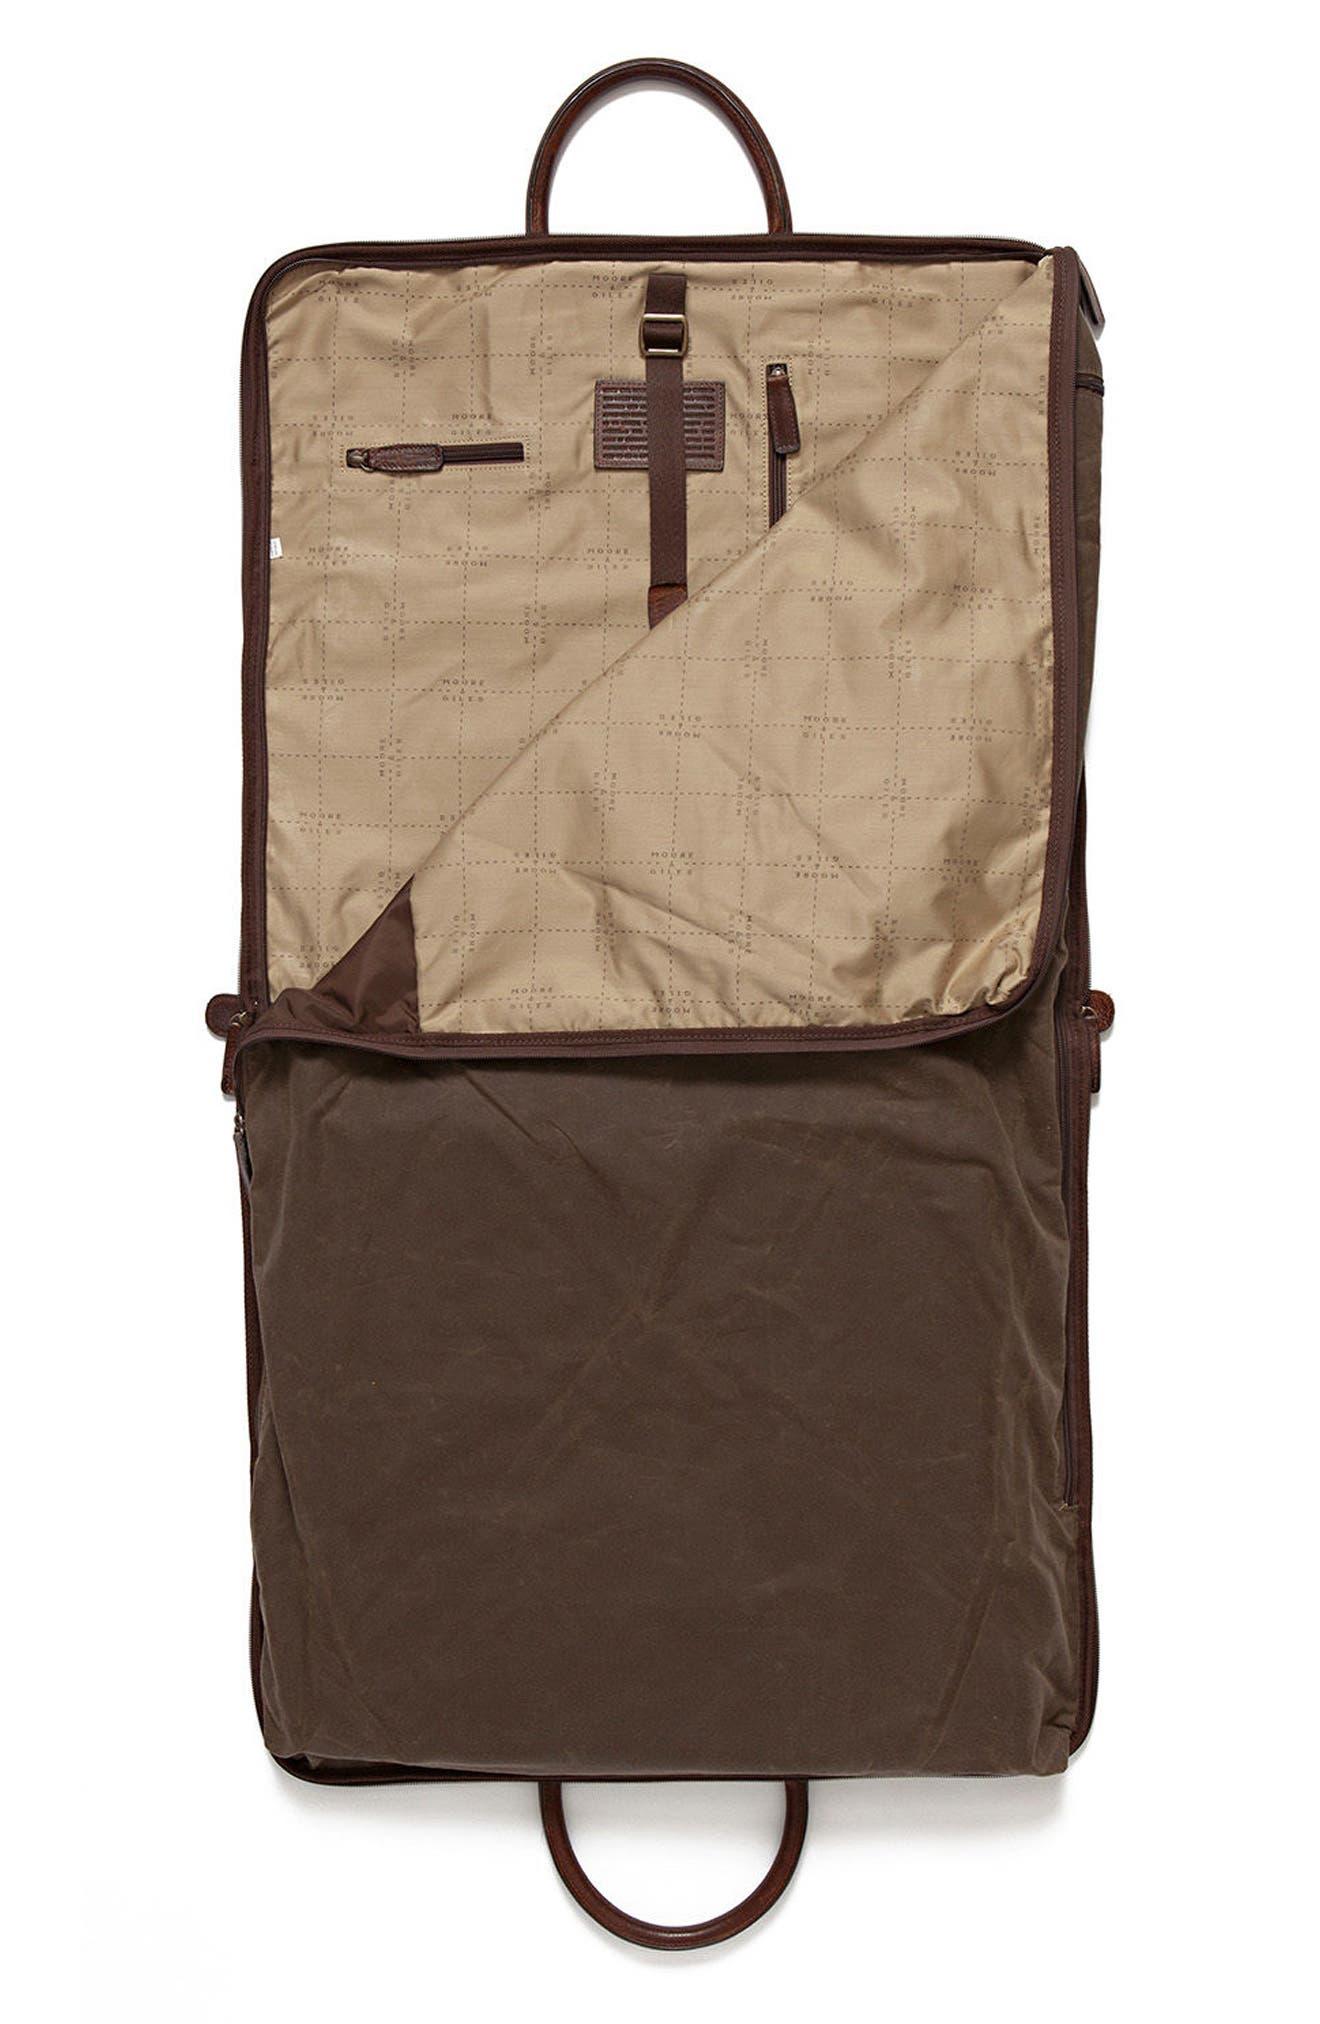 Gravely Garment Bag,                             Alternate thumbnail 2, color,                             WAXWEAR RANGERTAN